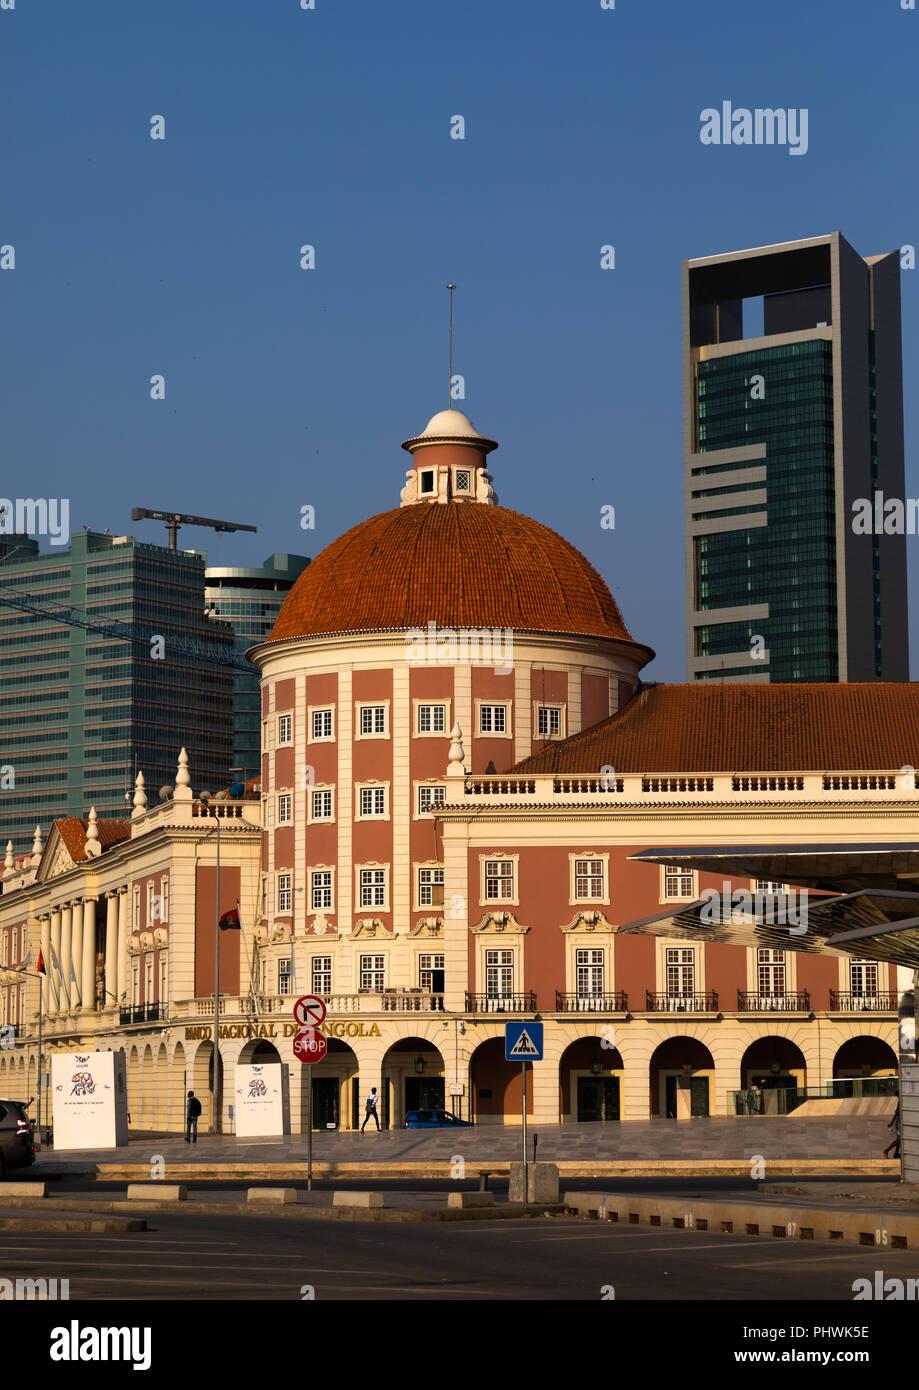 Banco nacional de Angola, Luanda Province, Luanda, Angola Stock Photo